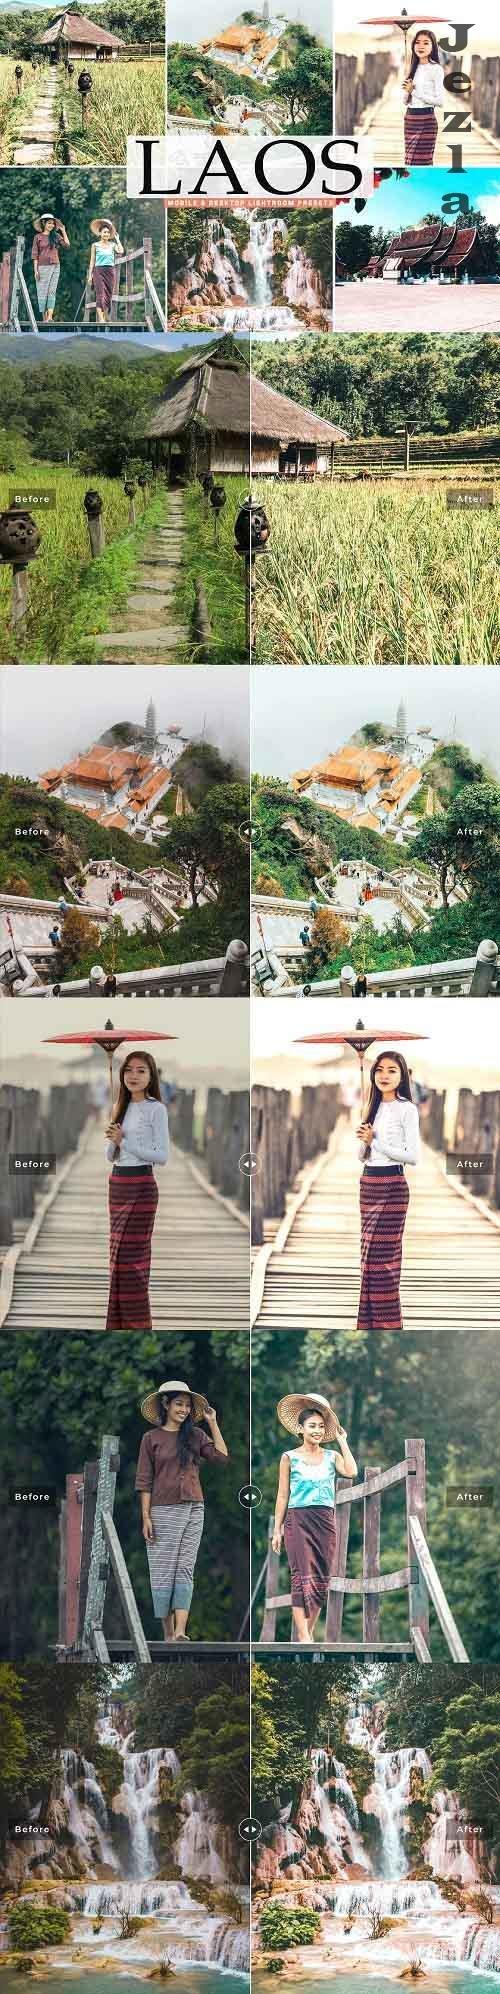 Laos Pro Lightroom Presets - 5542264 - Mobile & Desktop